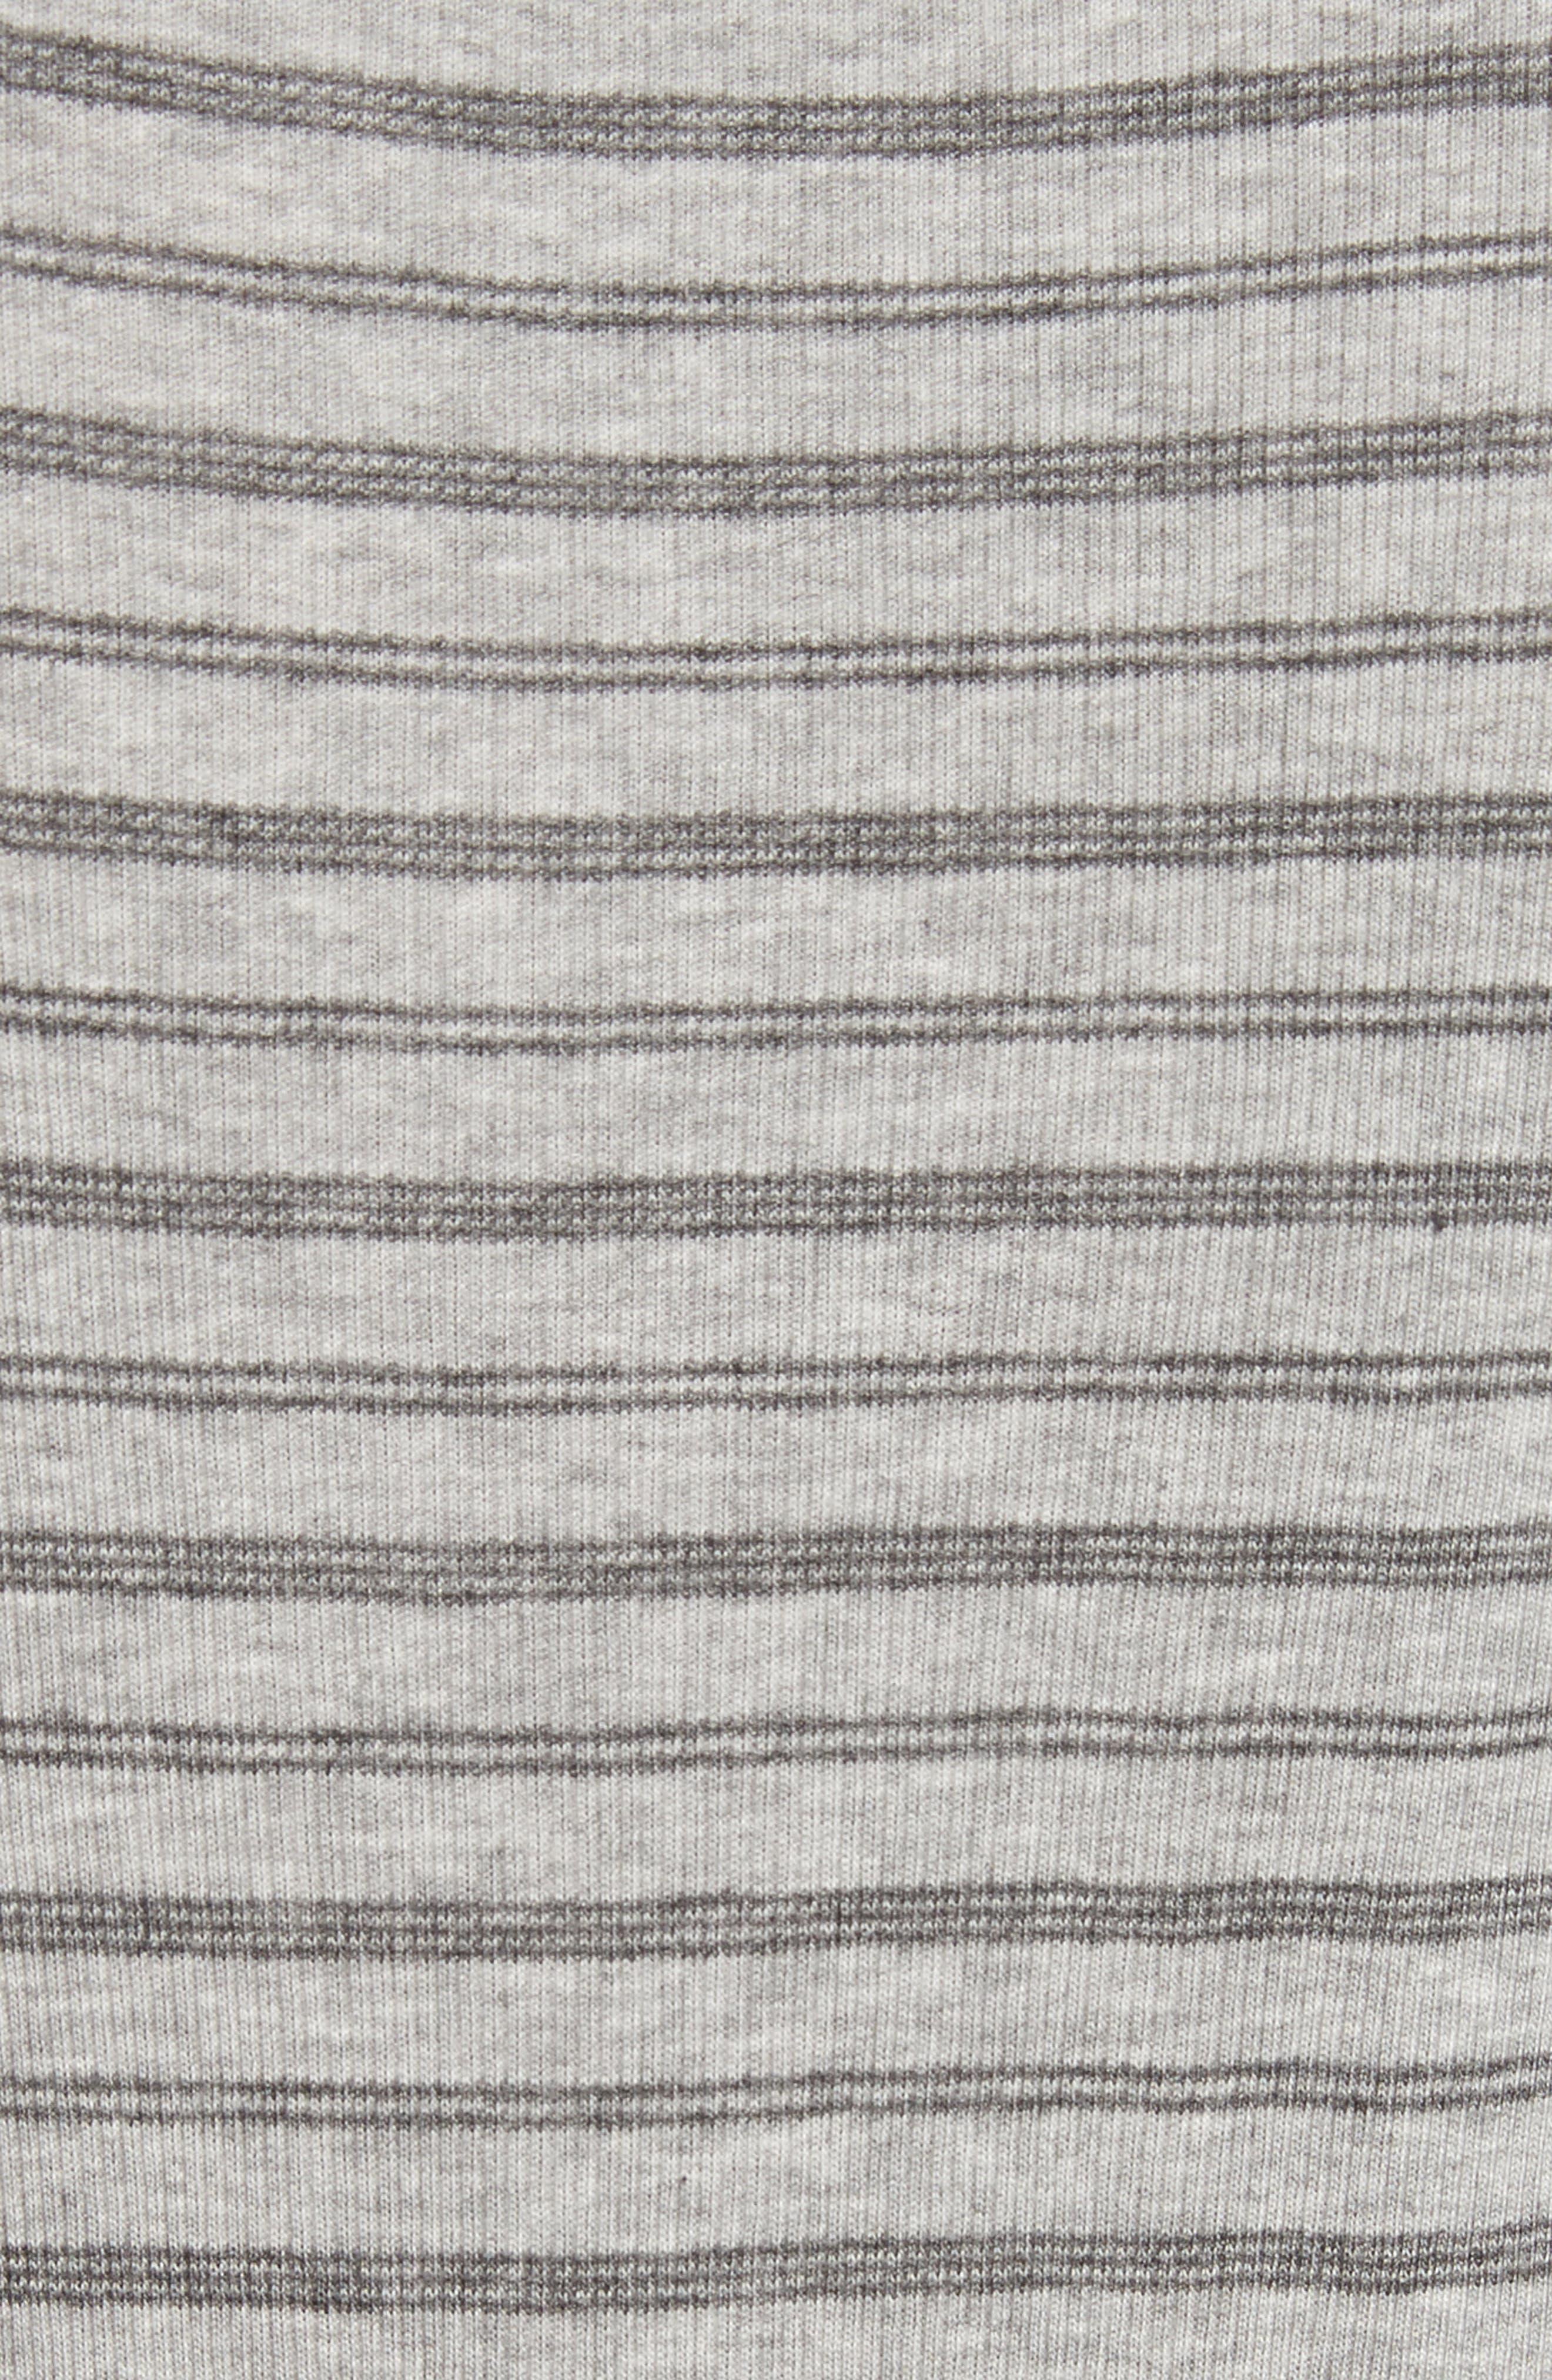 Double Stripe Top,                             Alternate thumbnail 6, color,                             Heather Grey